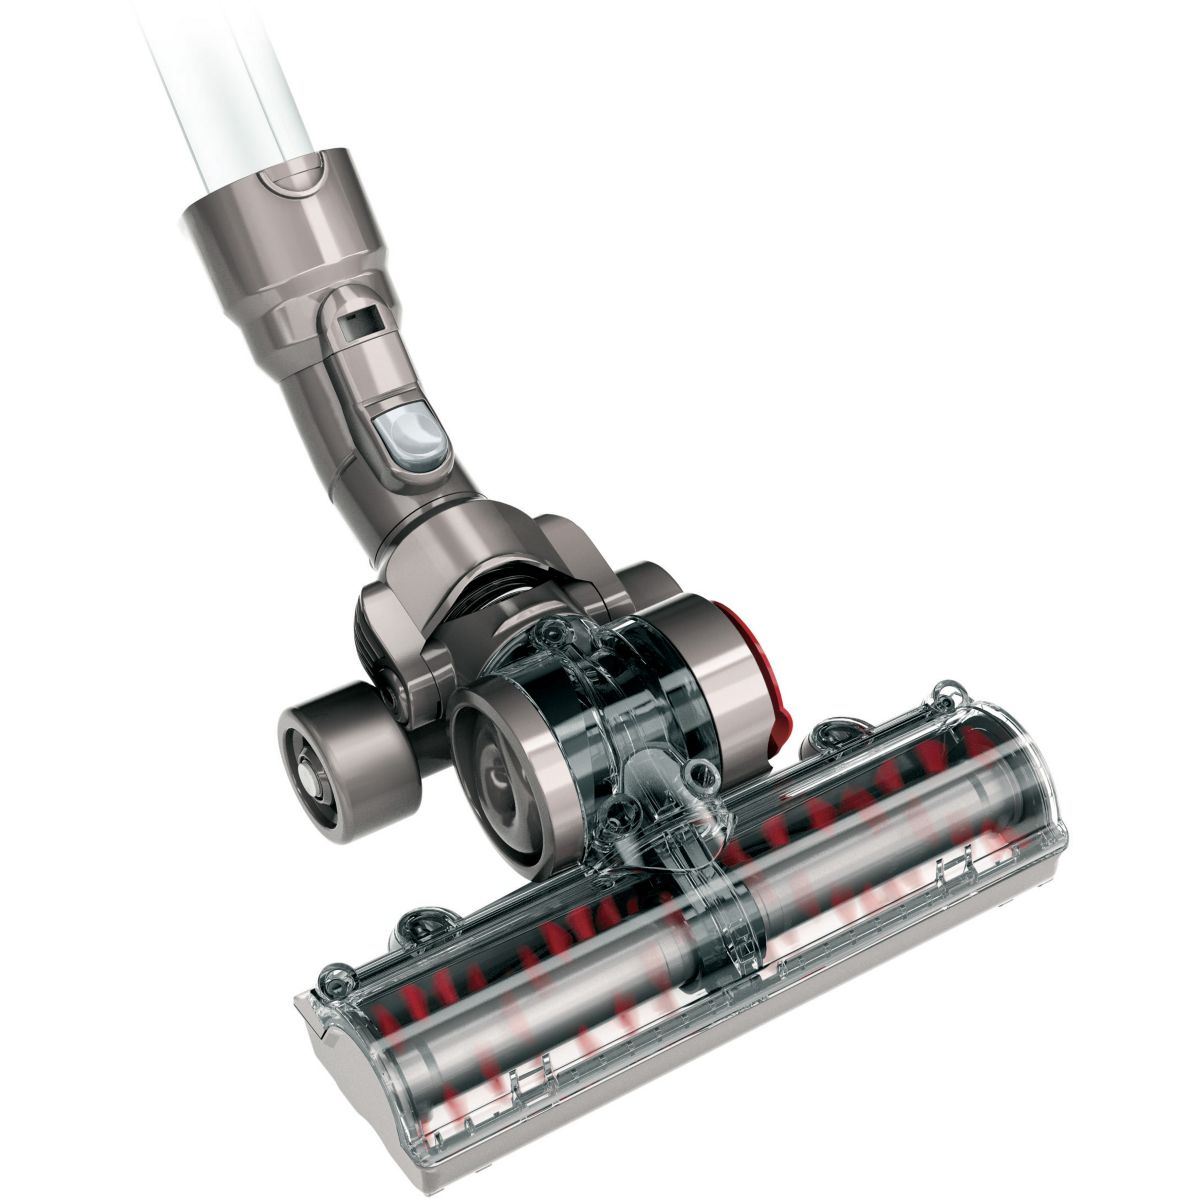 Turbobrosse dyson turbobrosse turbine head - livraison offerte : code premium